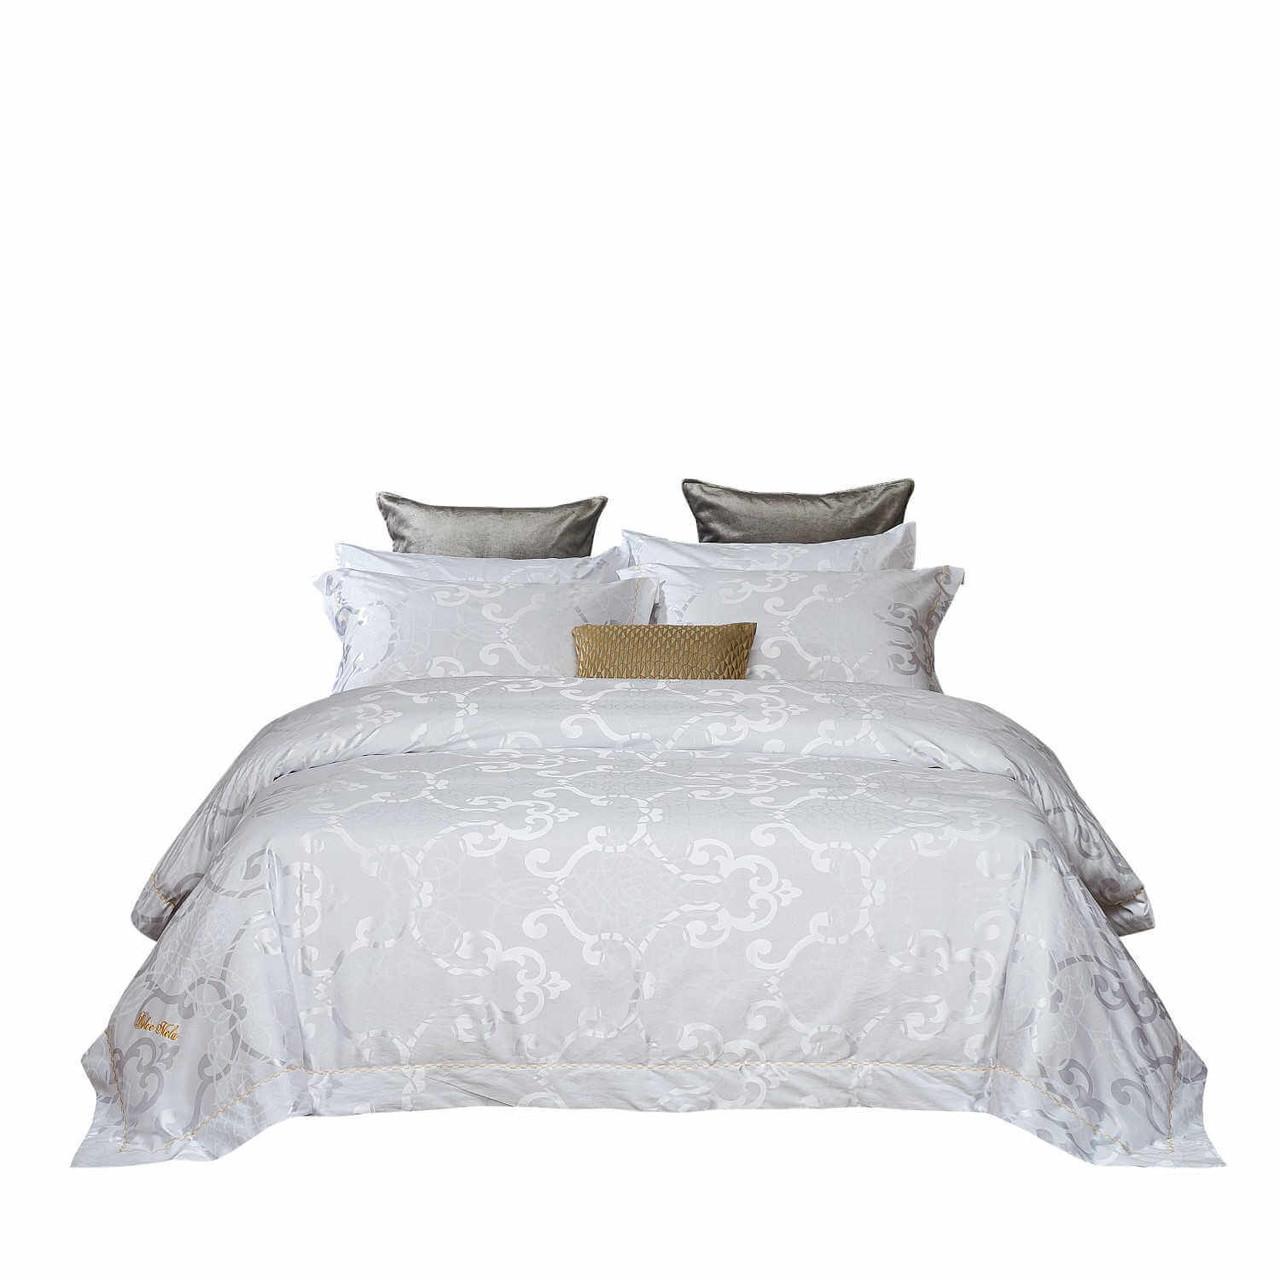 DM806Q Dolce-Mela Jacquard Bedding Set Wholesale-Dropship